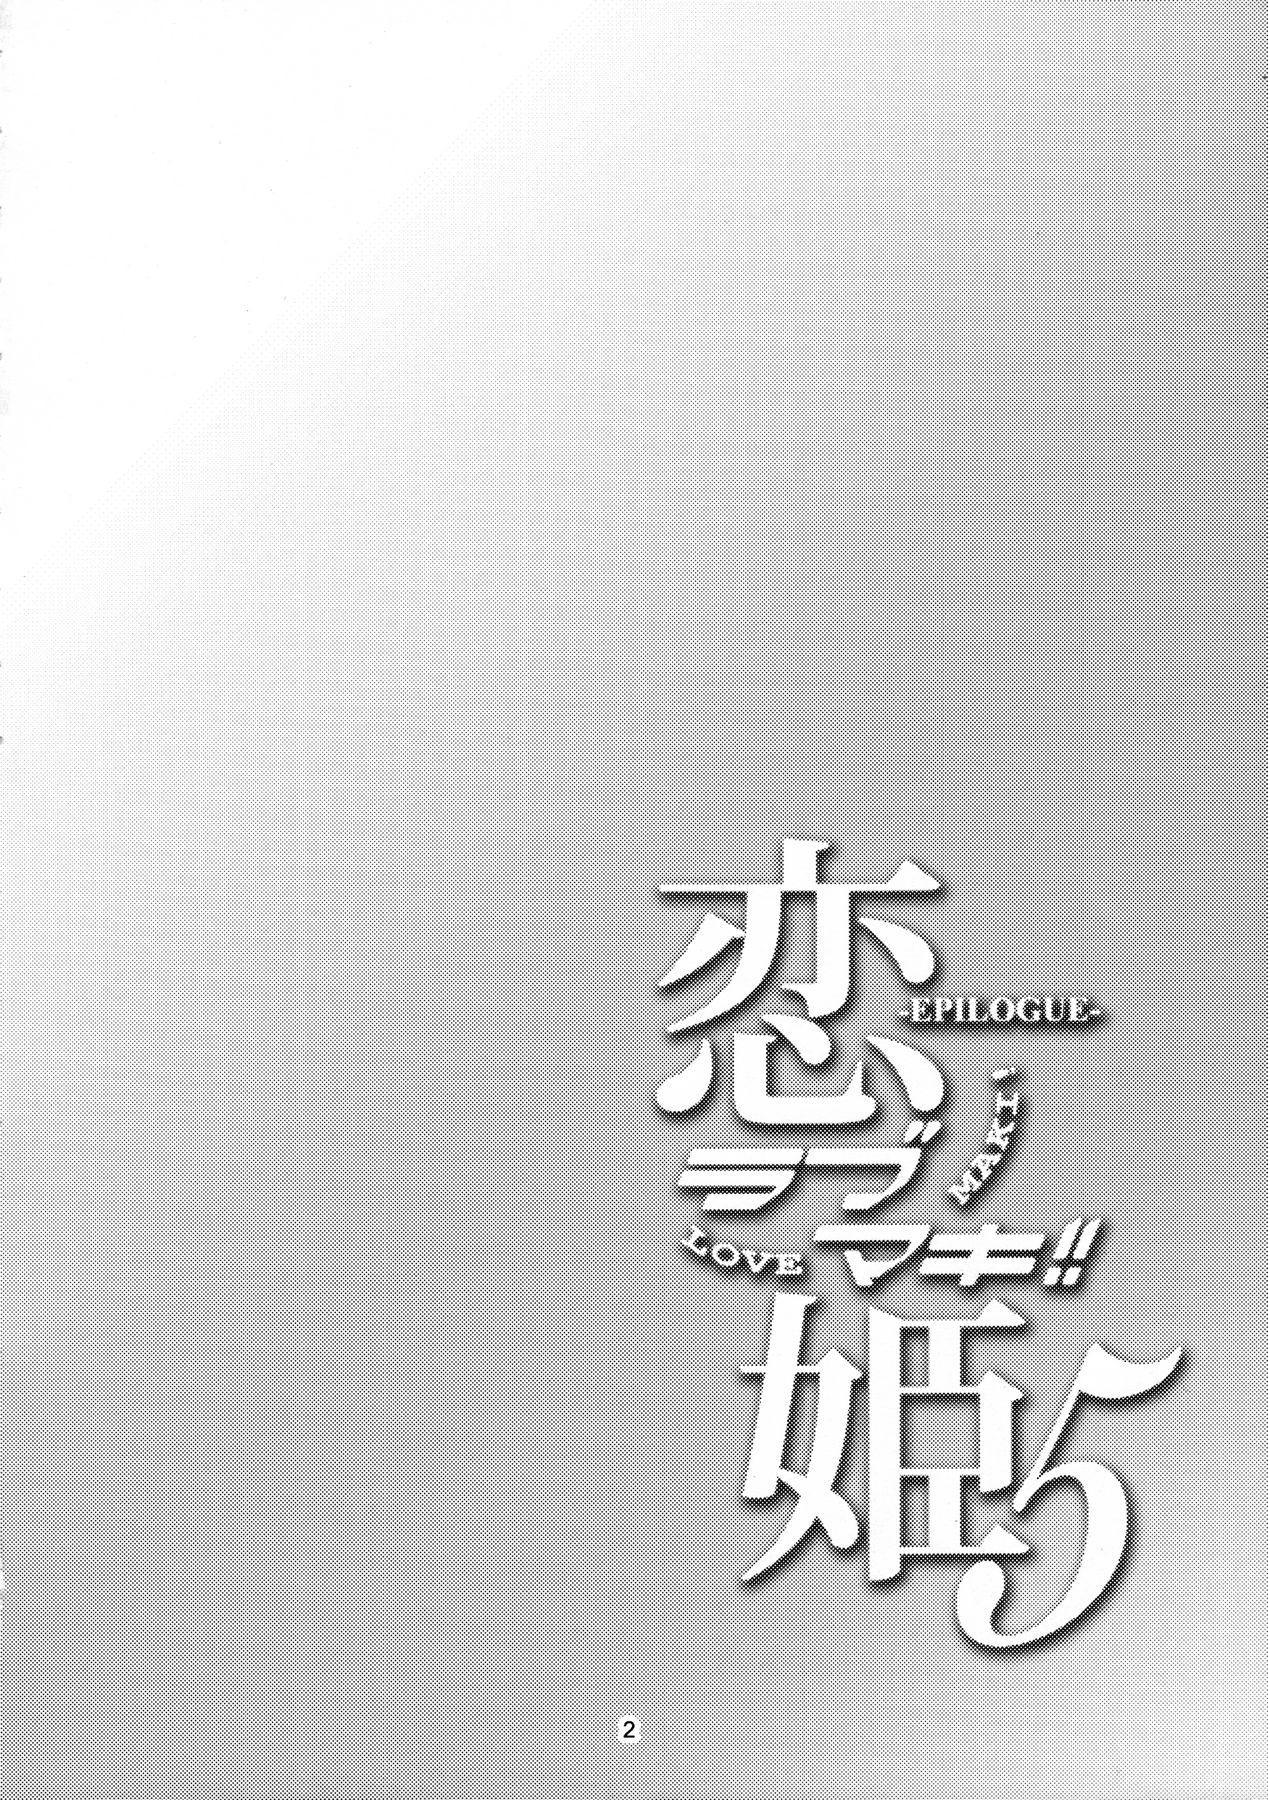 Koi Hime Love Maki!! 5 2